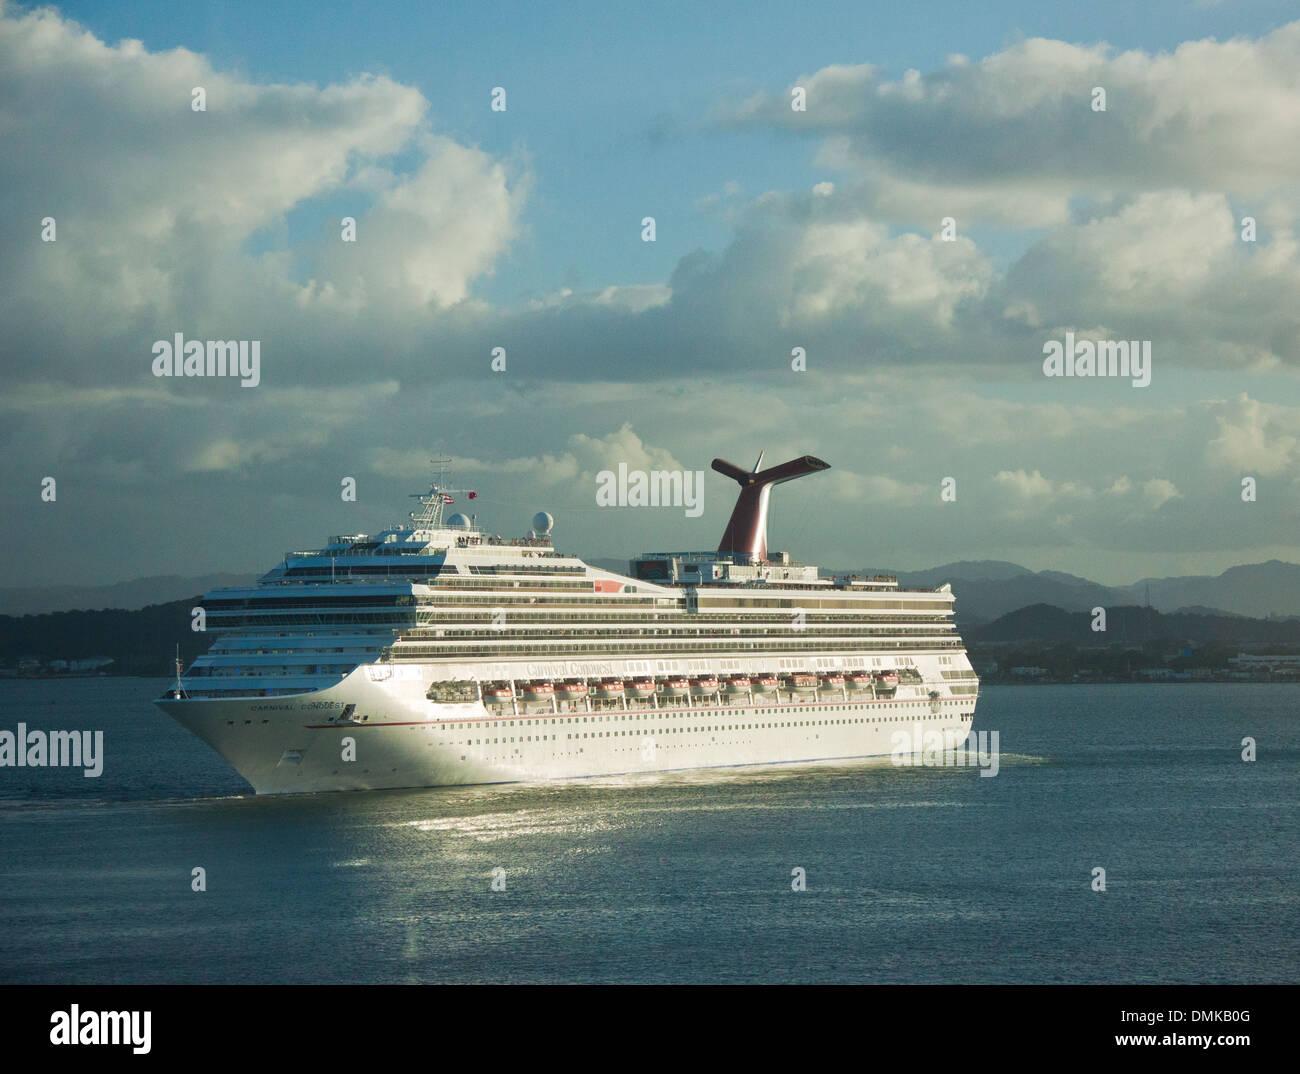 Carnival Conquest cruise ship entering port at San Juan, Puerto Rico Stock Photo